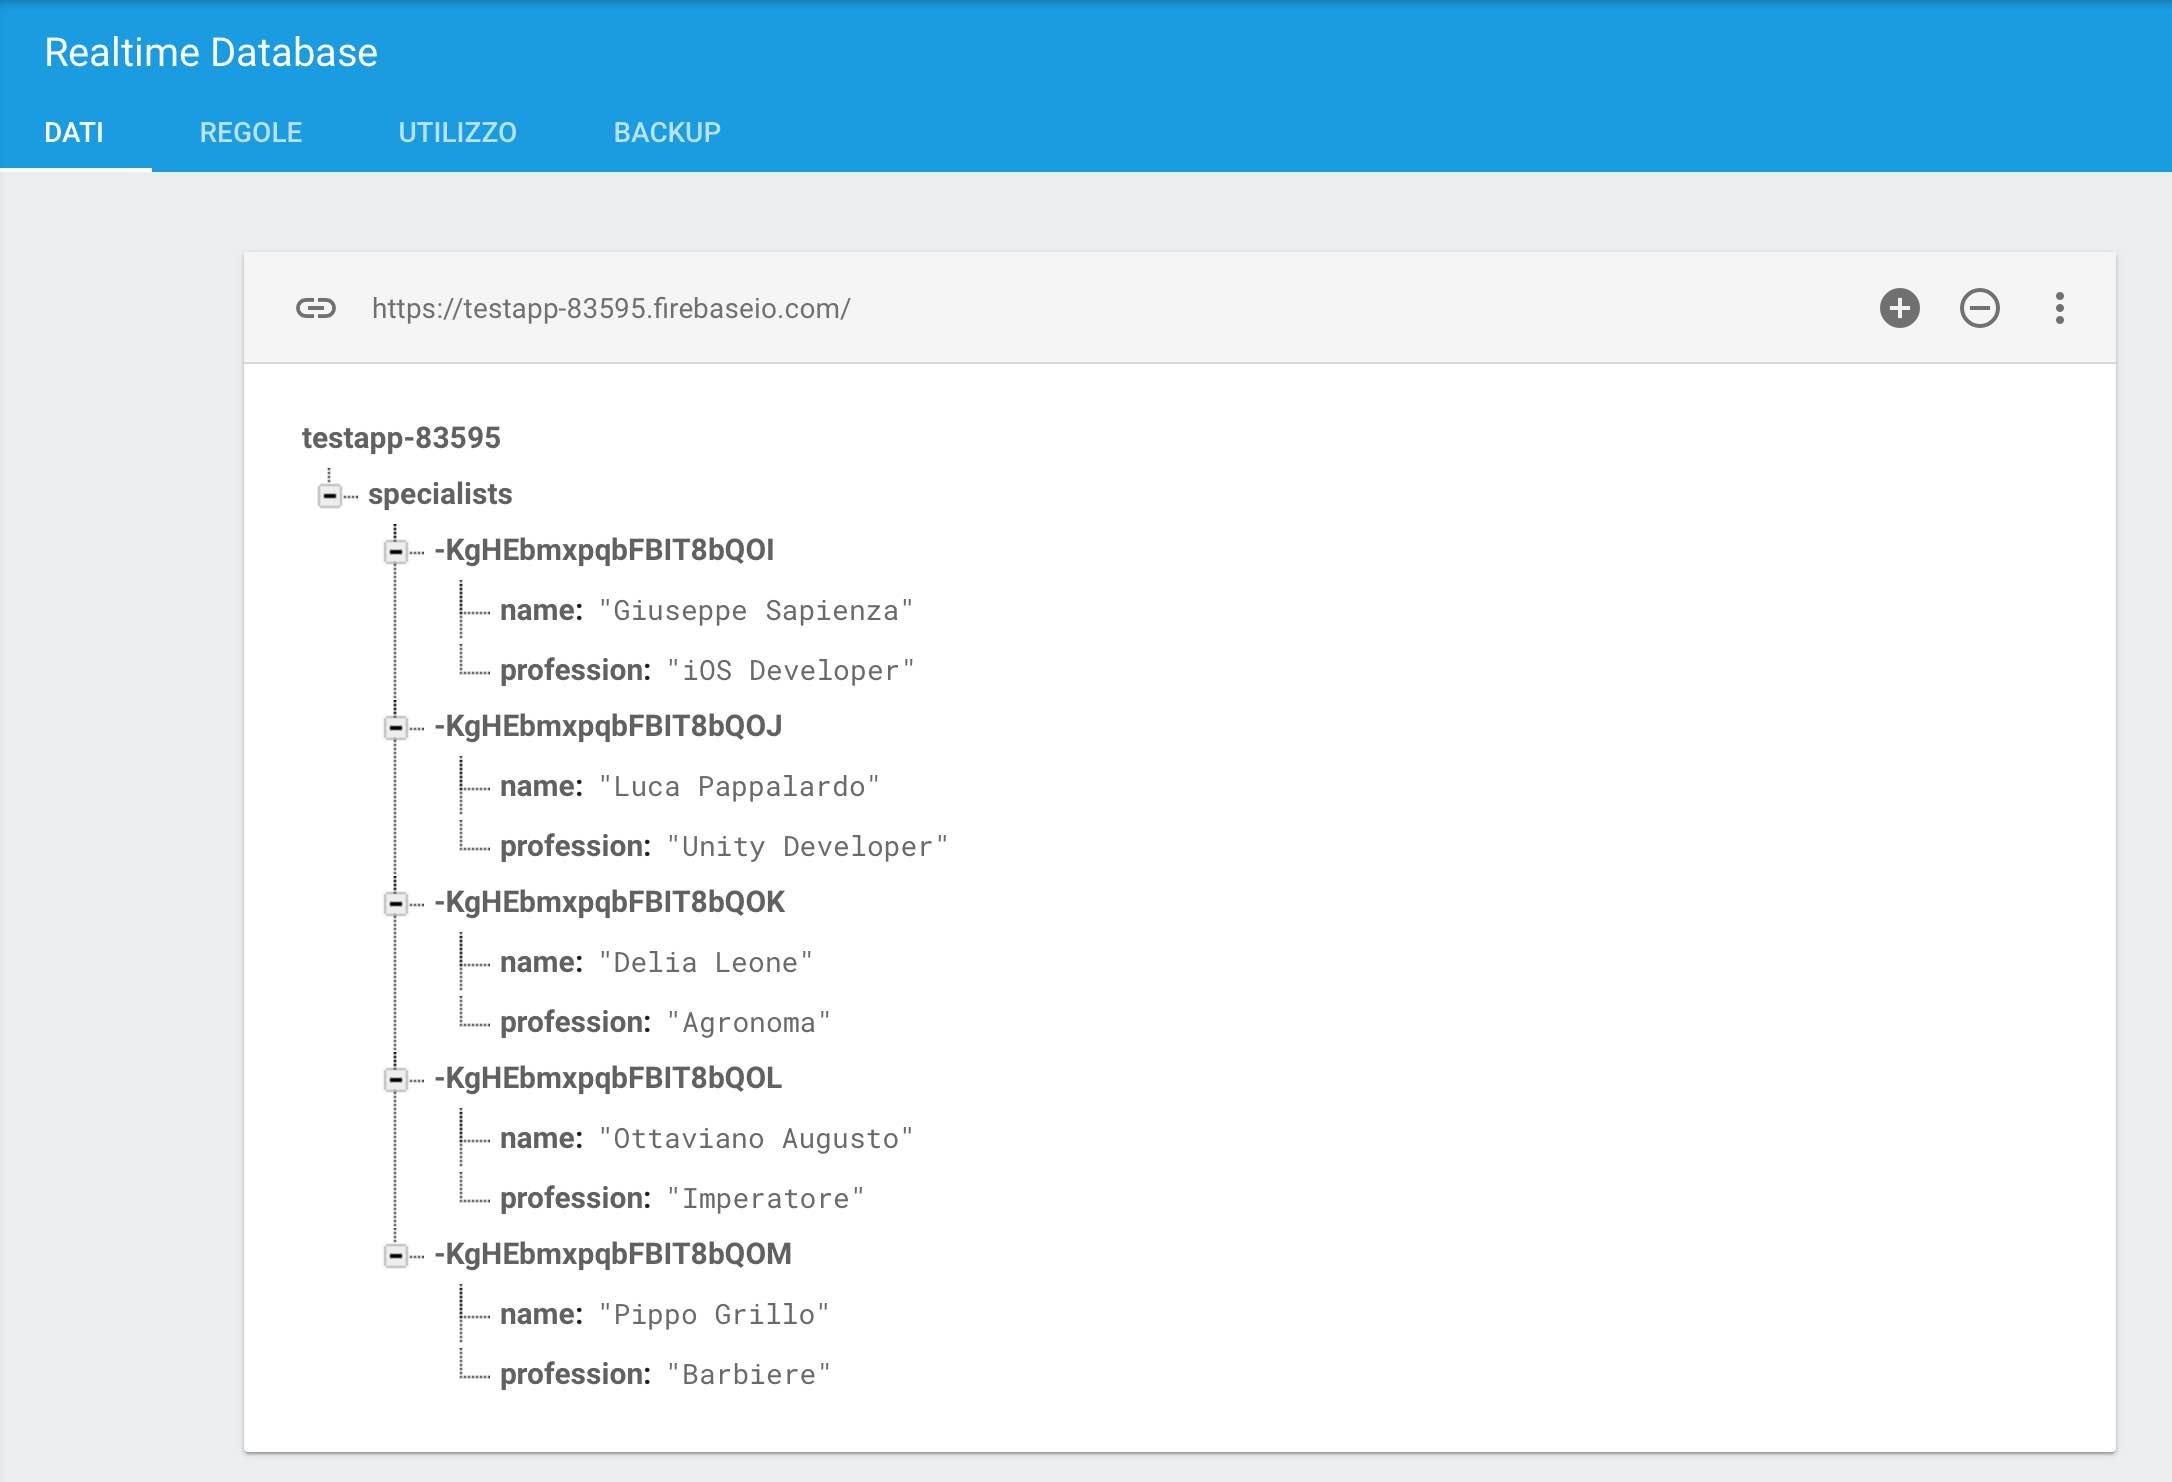 struttura-database-realtime-firebase